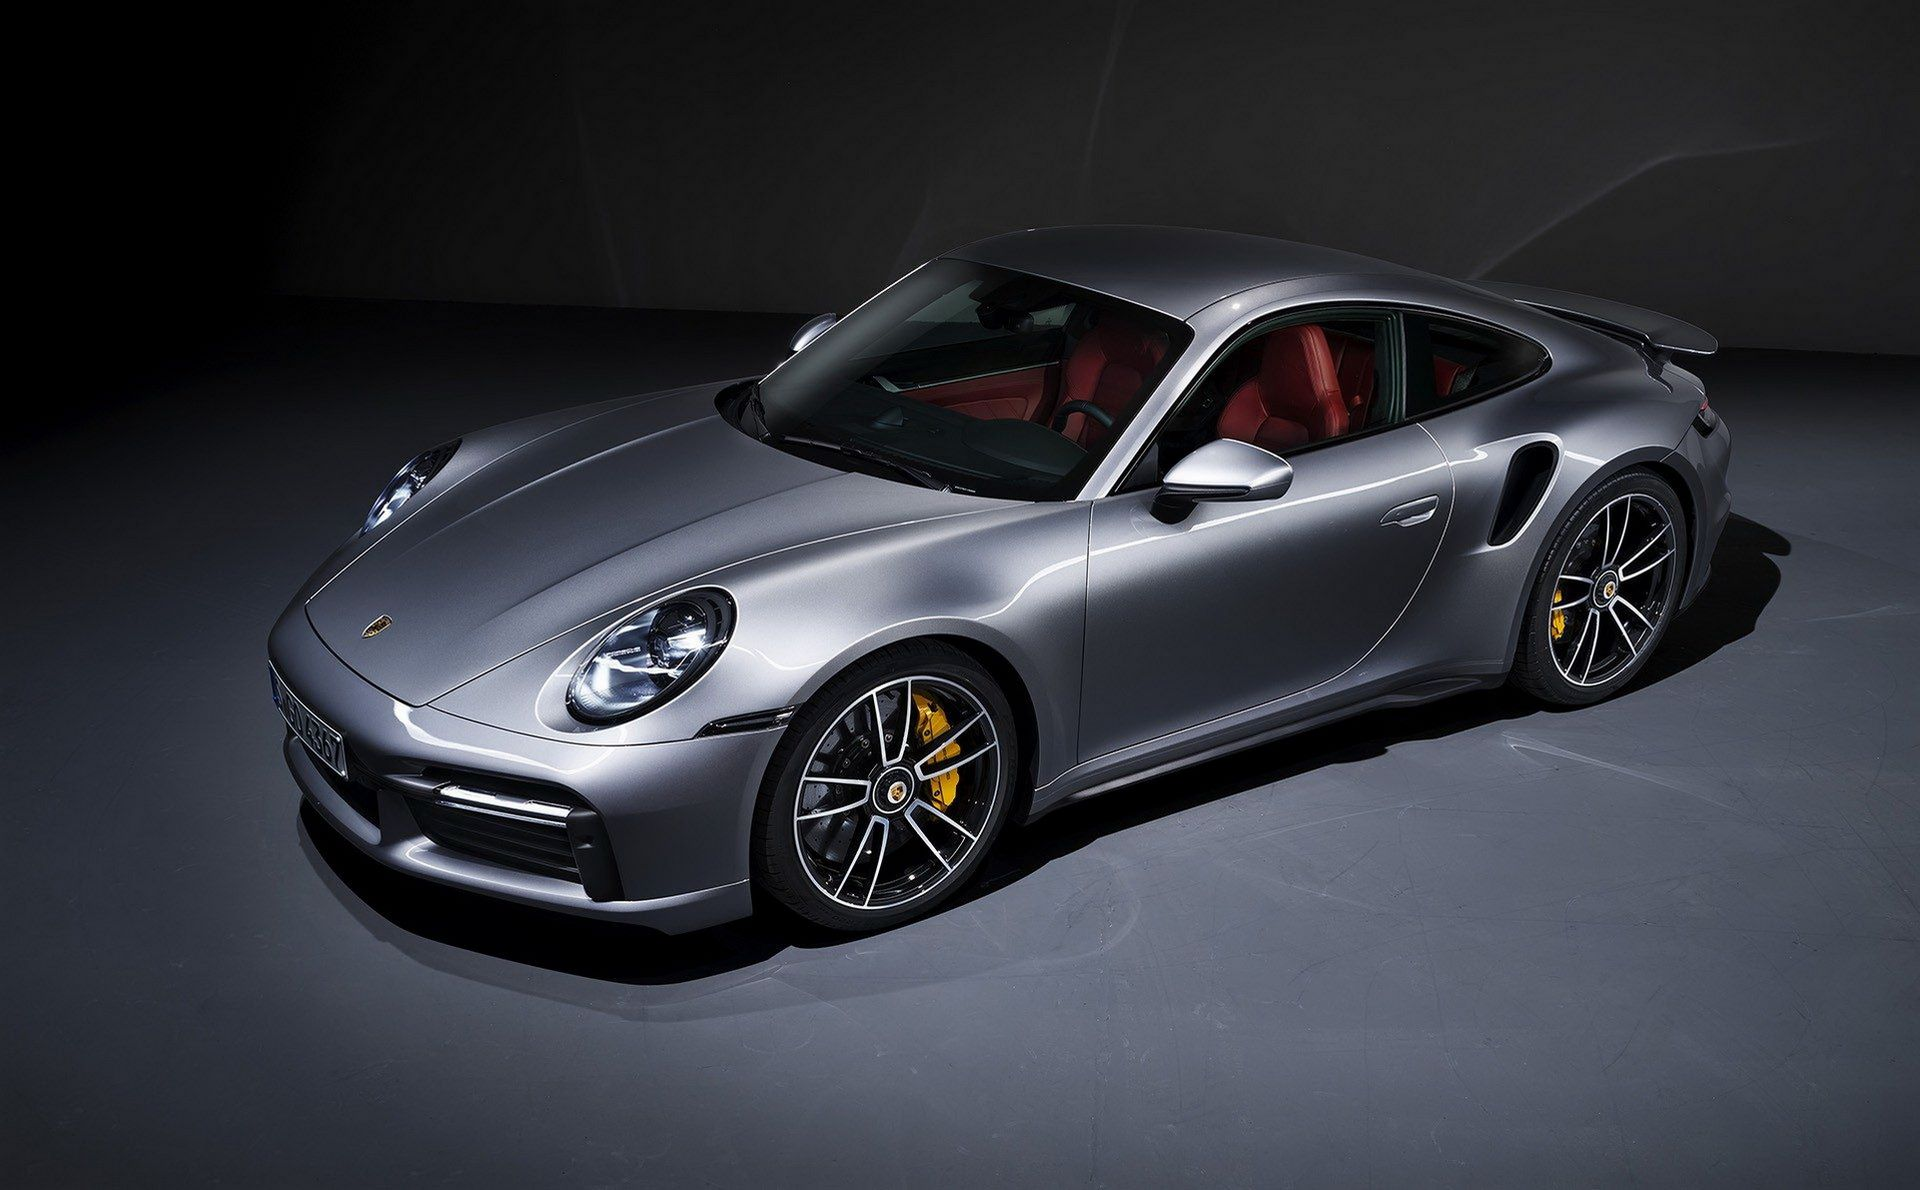 Porsche-911-Turbo-S-2020-16